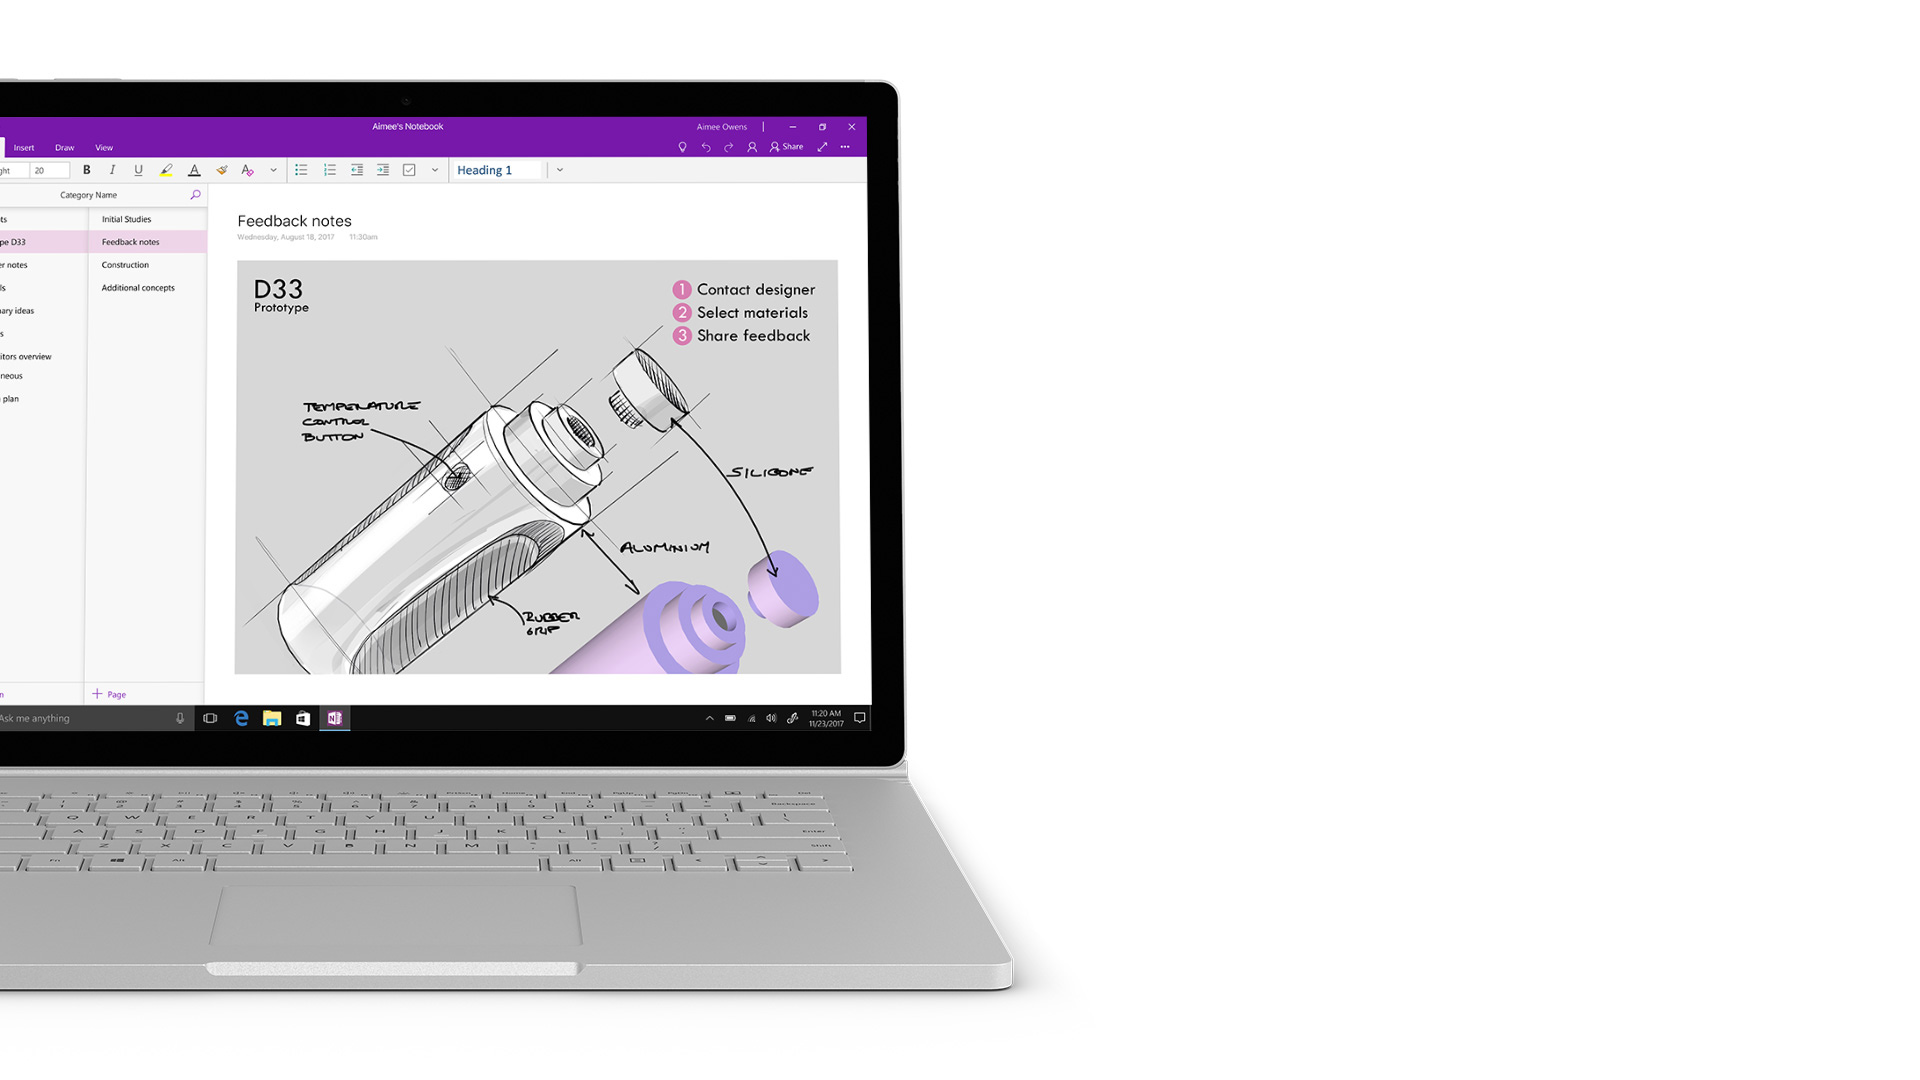 Surface 上的 OneNote 螢幕擷取畫面。